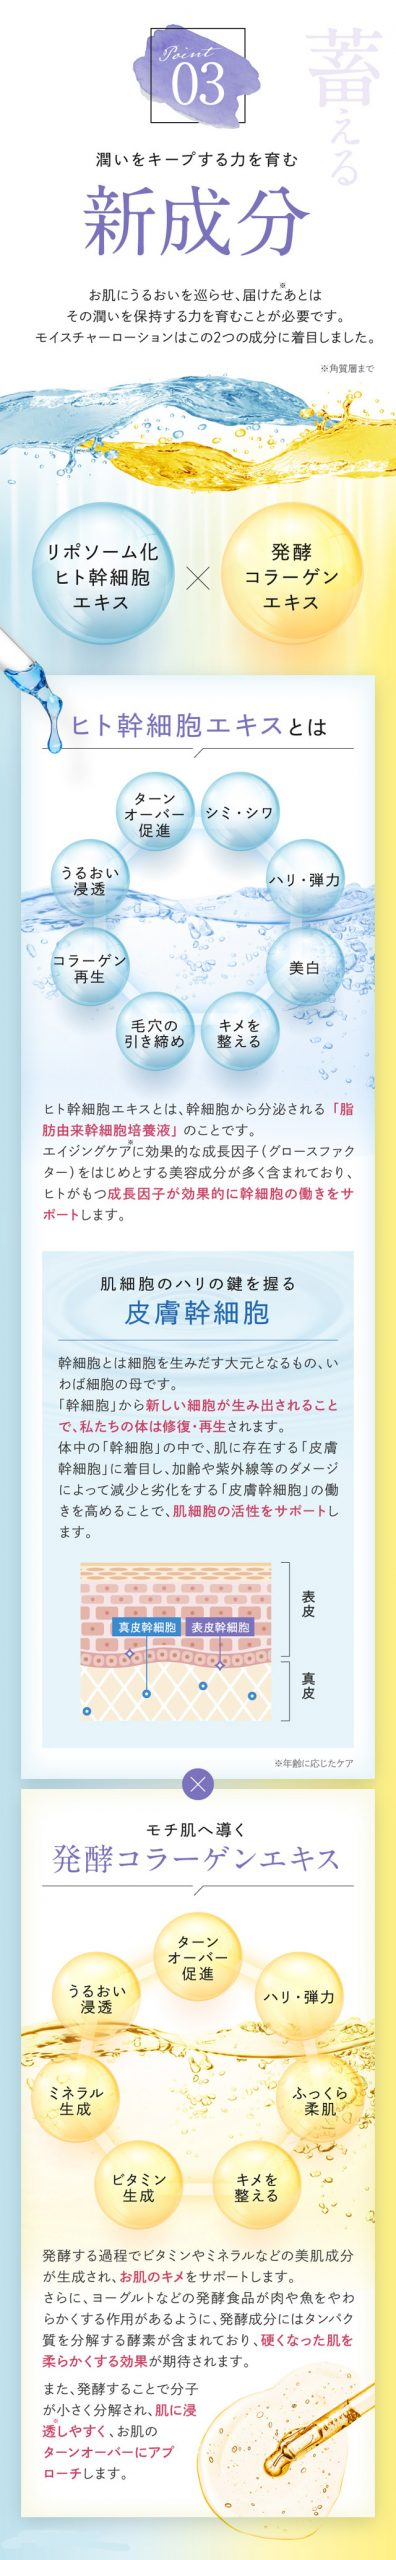 shimaboshi(シマボシ) モイスチャーローション,特徴,効果